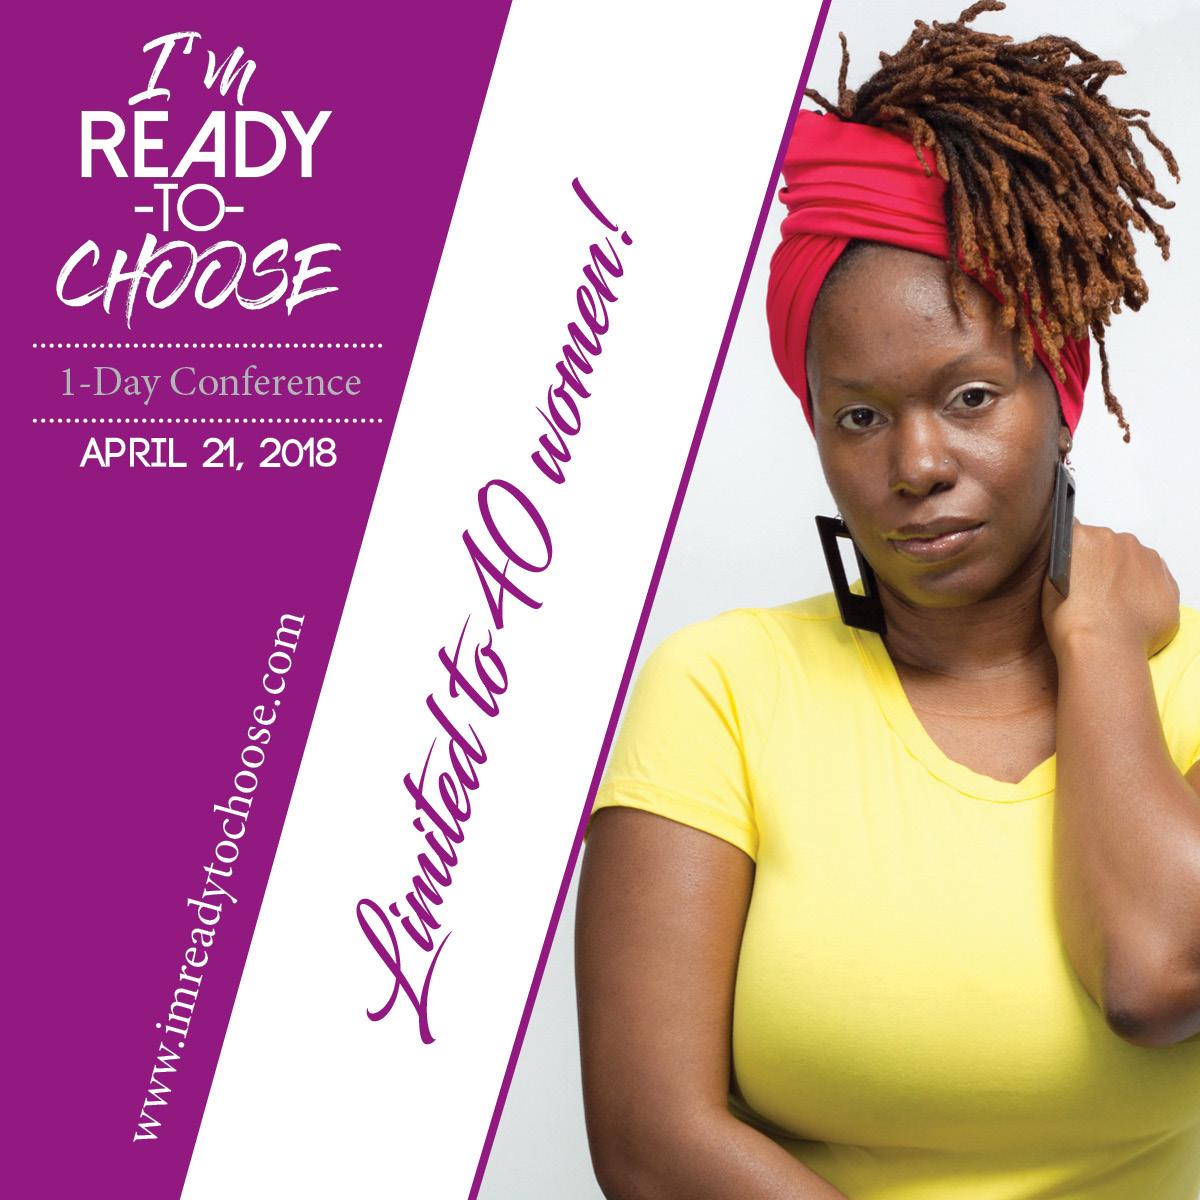 ready2choose promos6